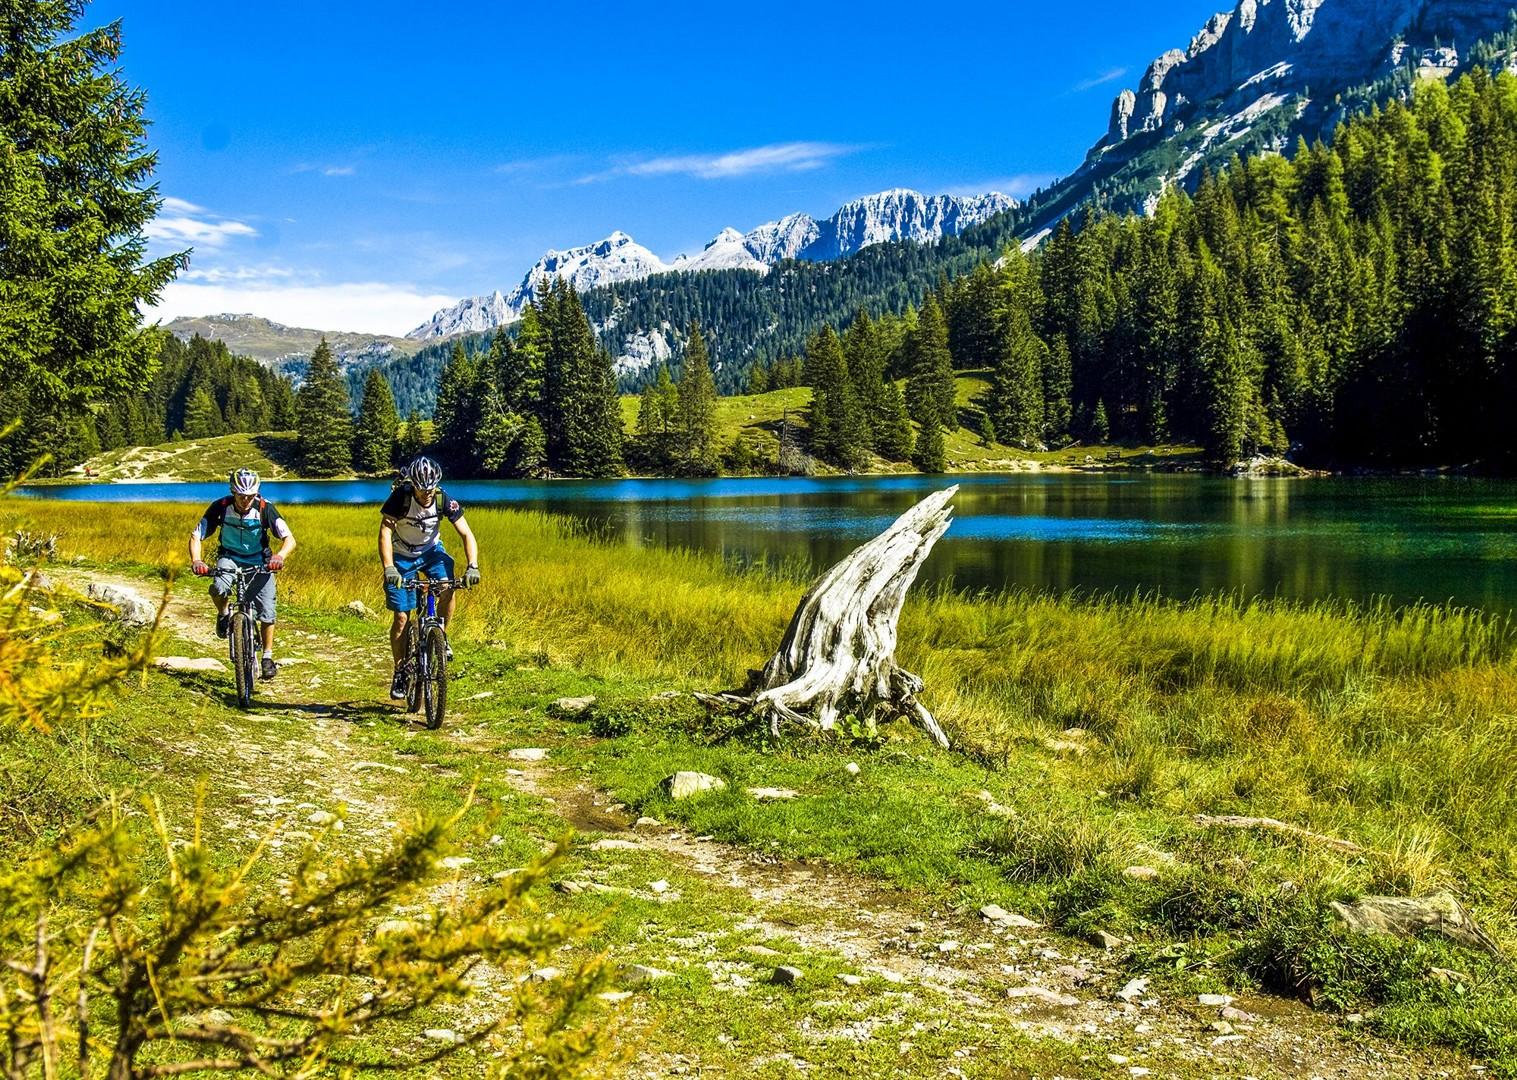 Brenta_Bike_2007_109-2.jpg - Italy - Dolomites of Brenta - Guided Mountain Bike Holiday - Mountain Biking